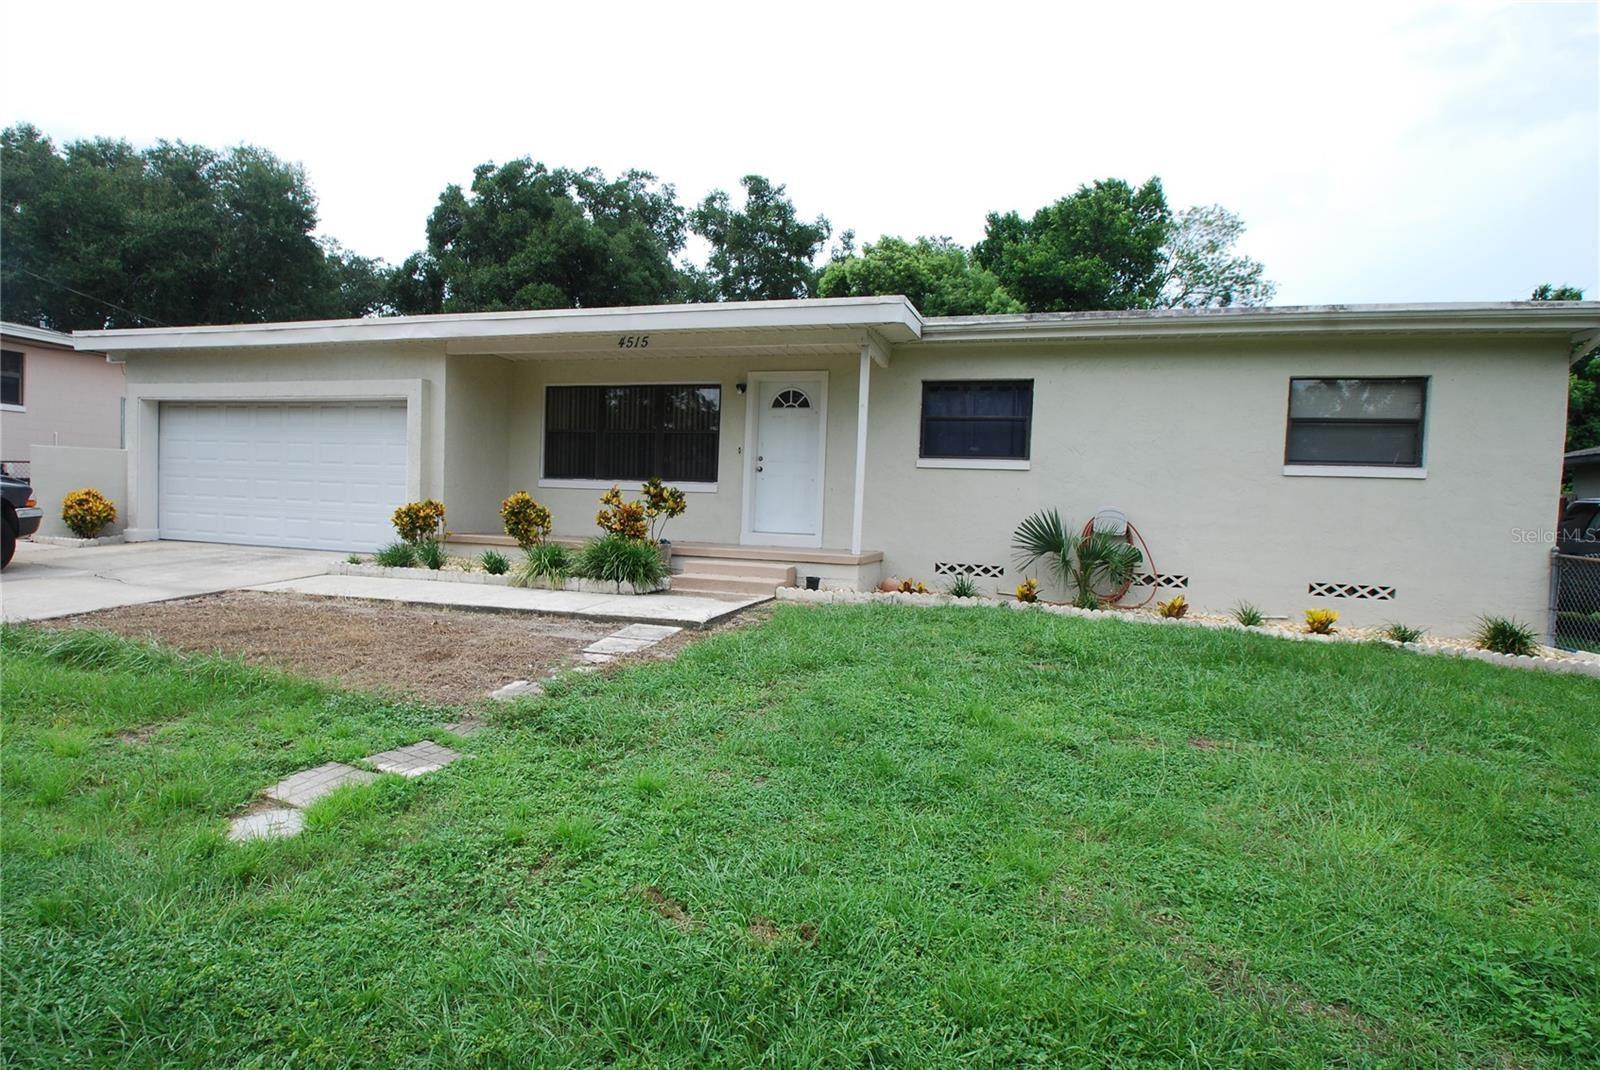 4515 JIM GLENN DRIVE, Orlando, FL 32808 - MLS#: O5969463